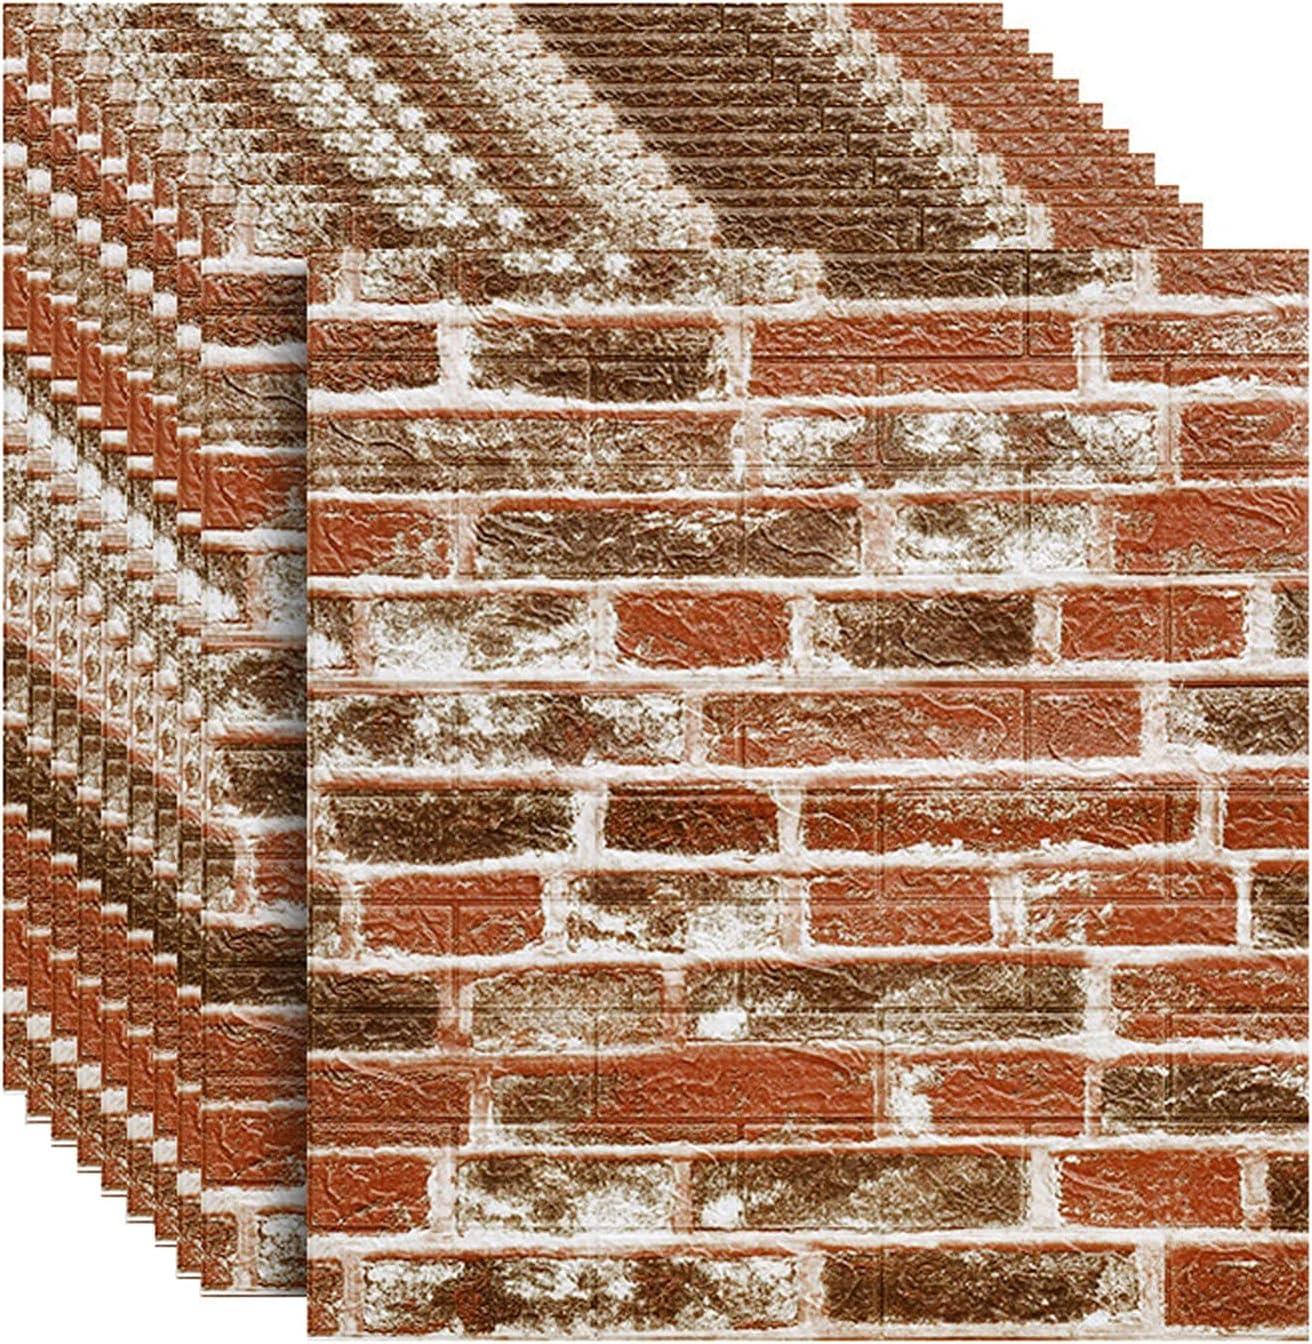 DLMSDG 3D Wallpapers Brick Wall Wallpaper Pane Self-Adhesive Soldering 2021new shipping free shipping